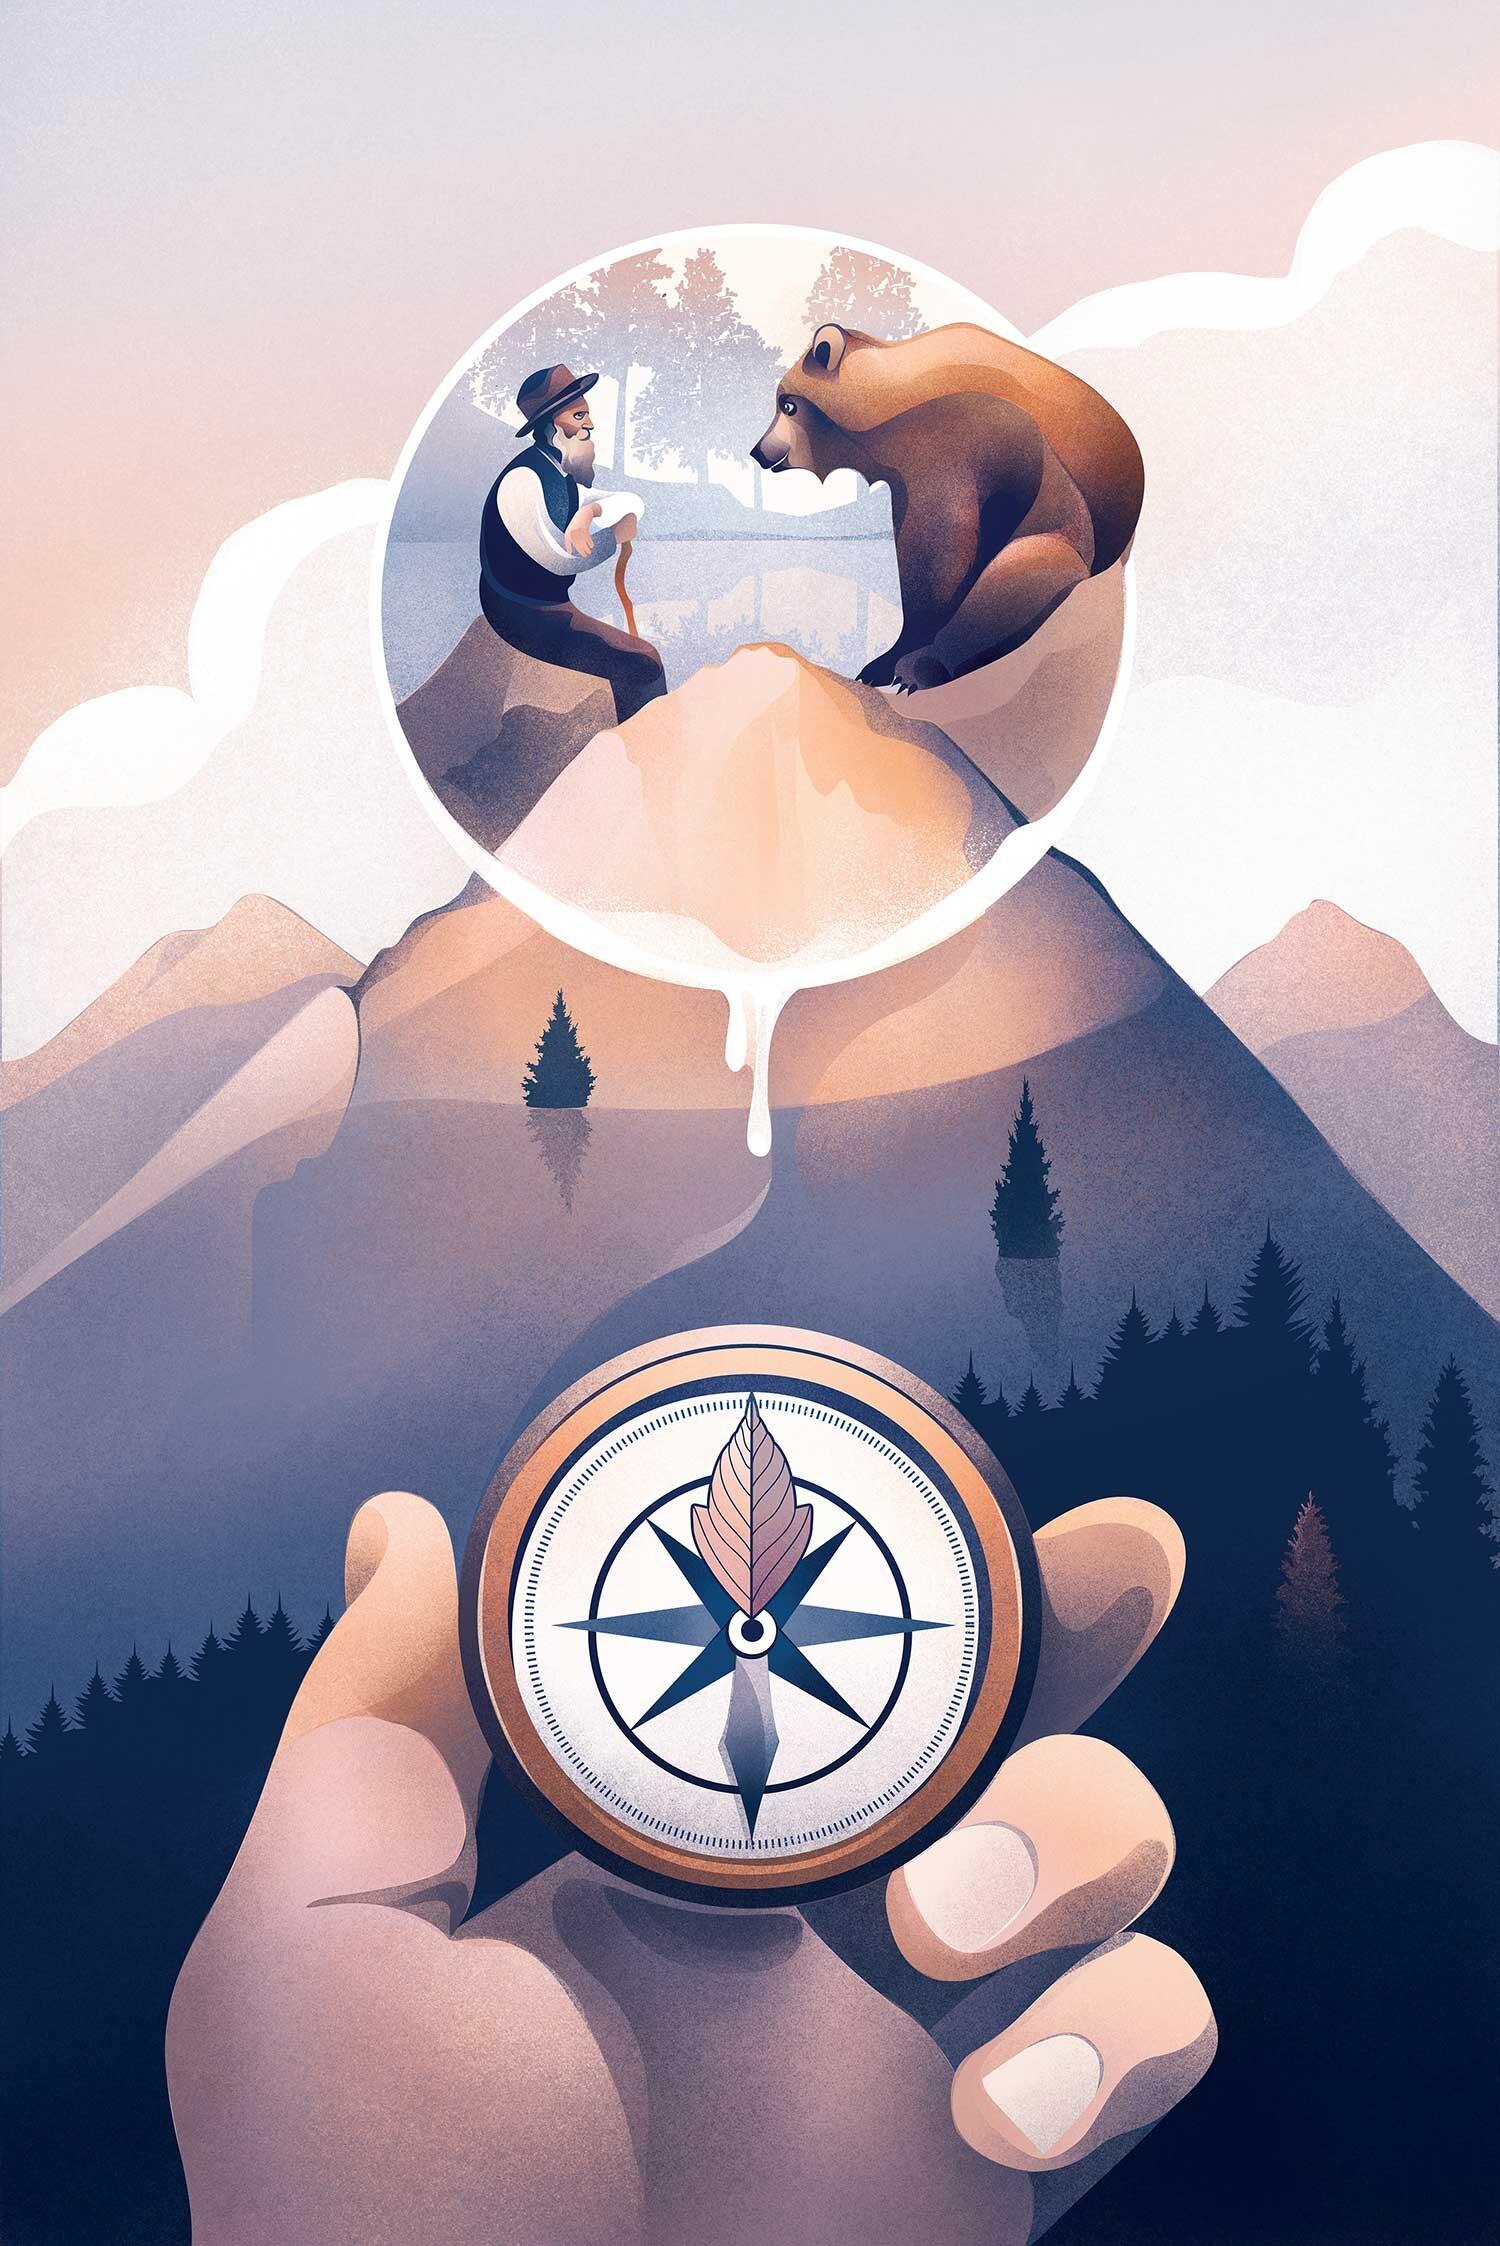 JOHN_MUIR_SIERRA_Karla_Sanders_illustration.jpg